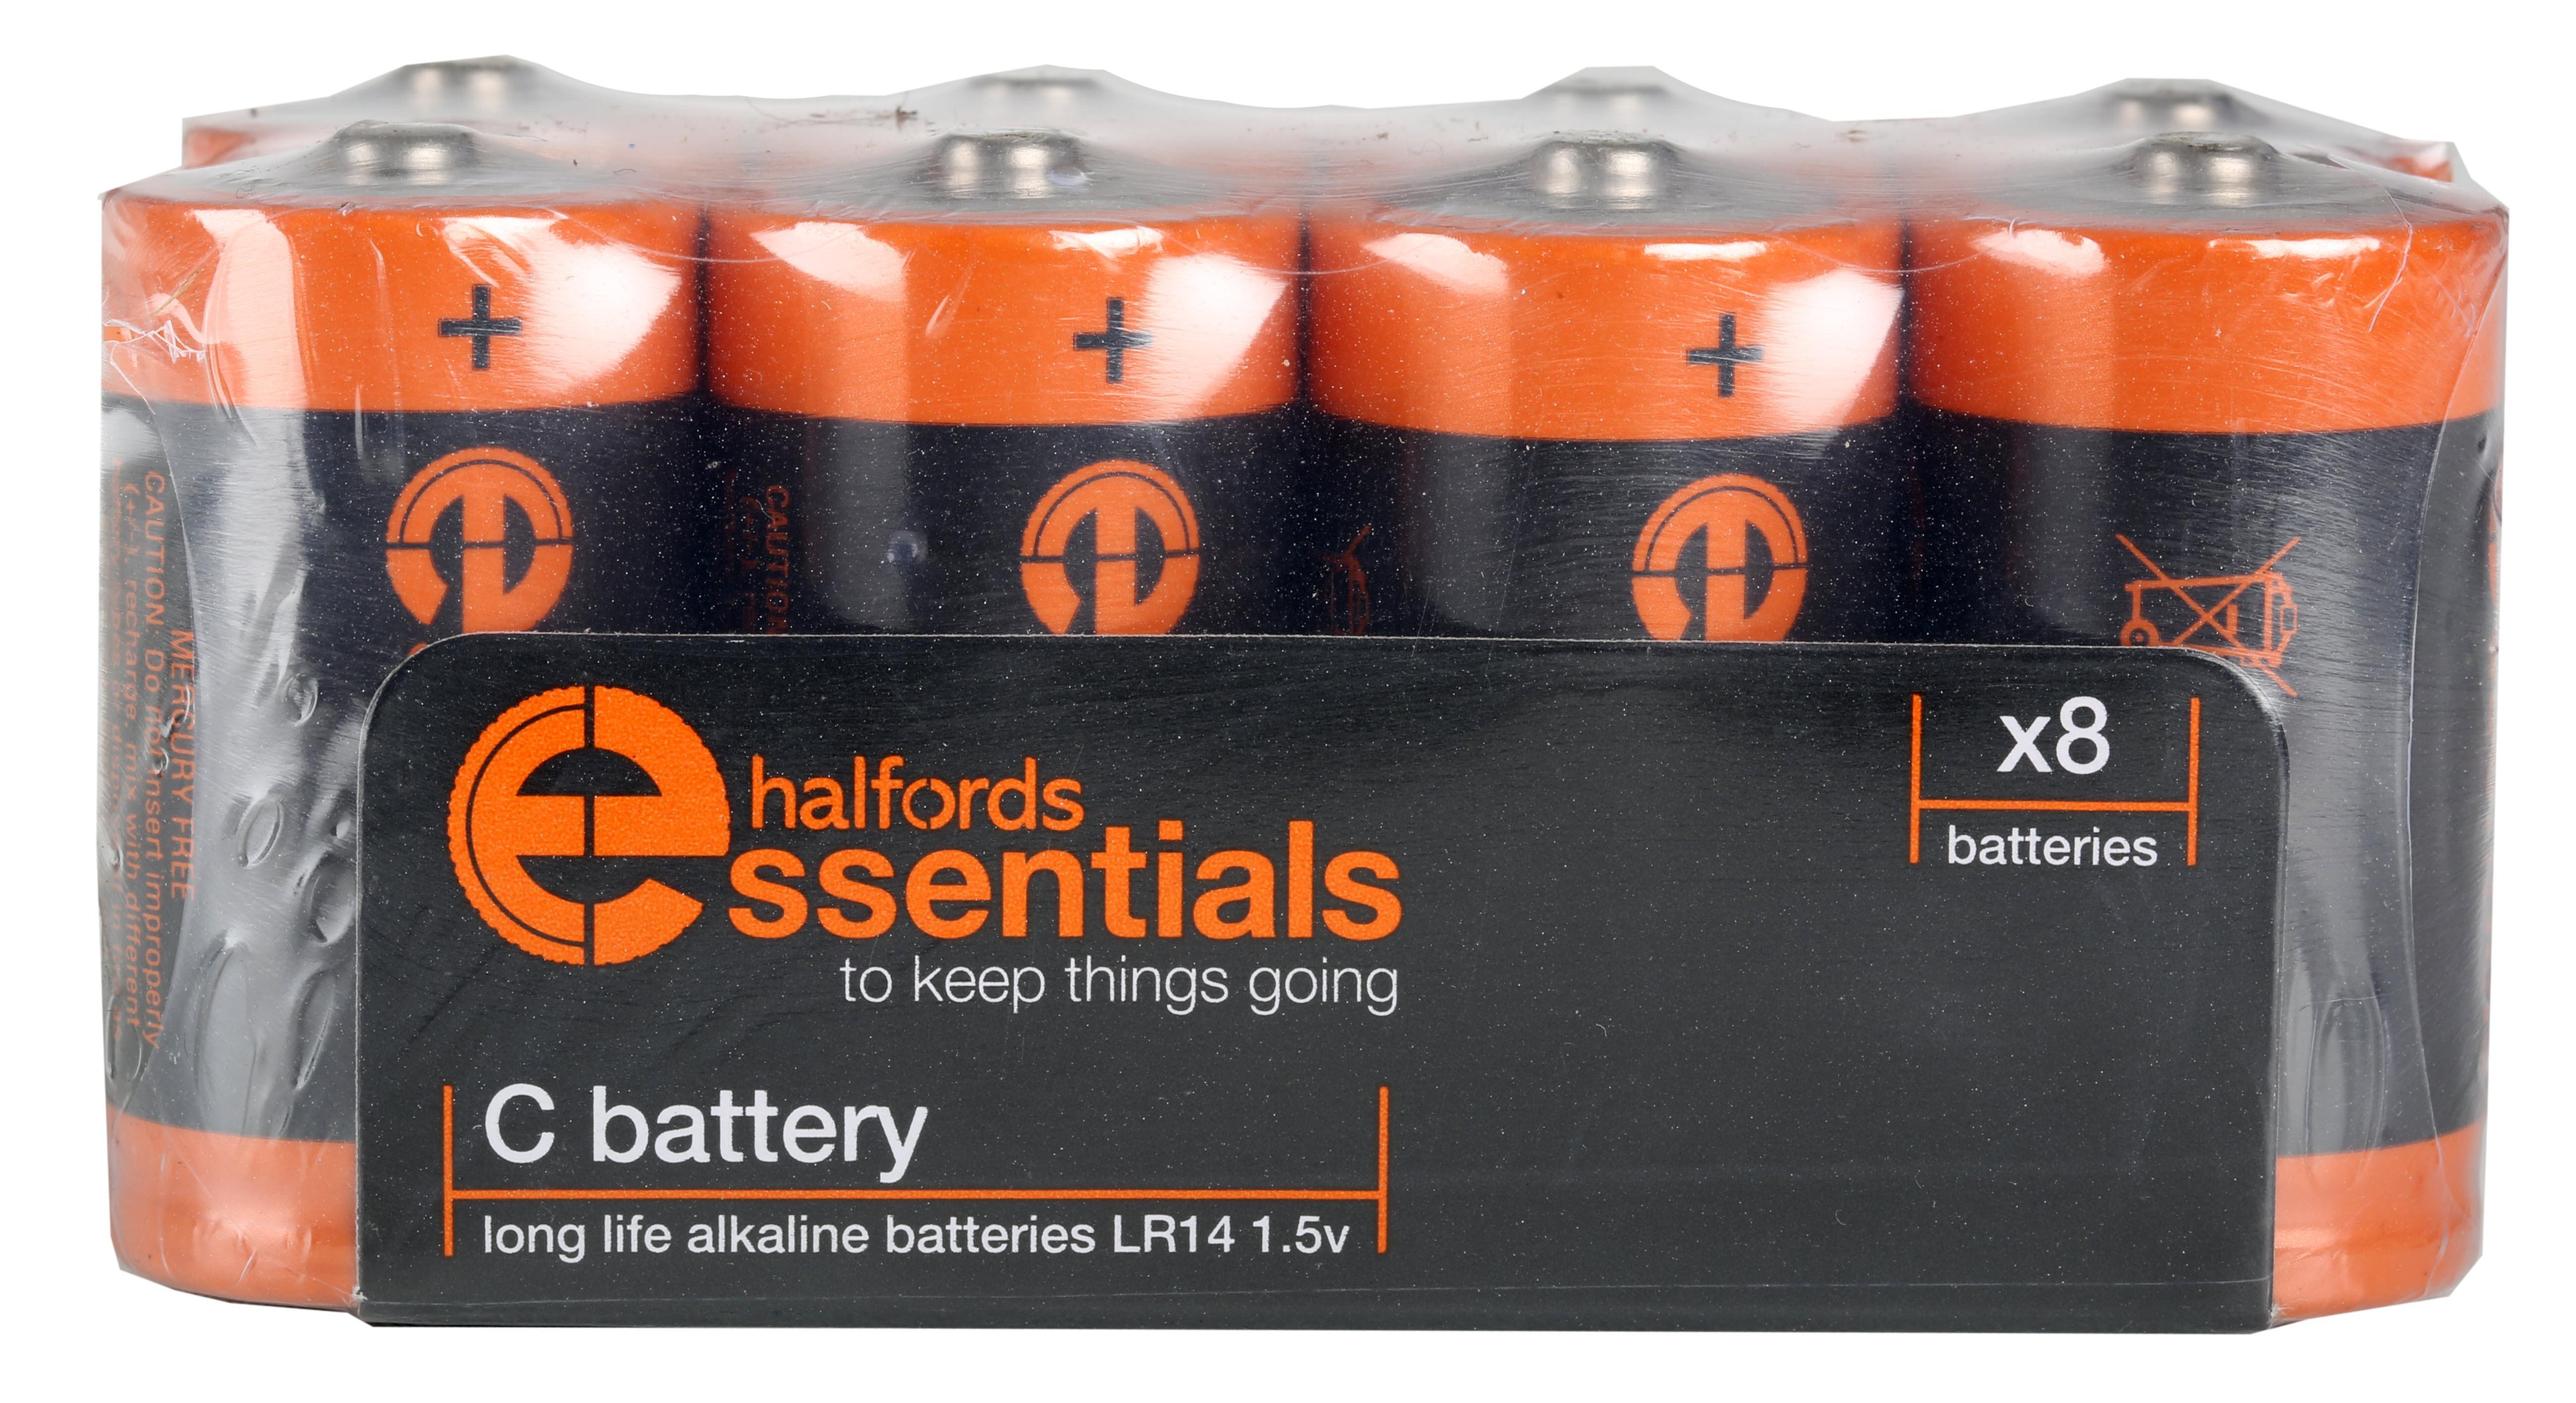 Halfords Essential Batteries C x8